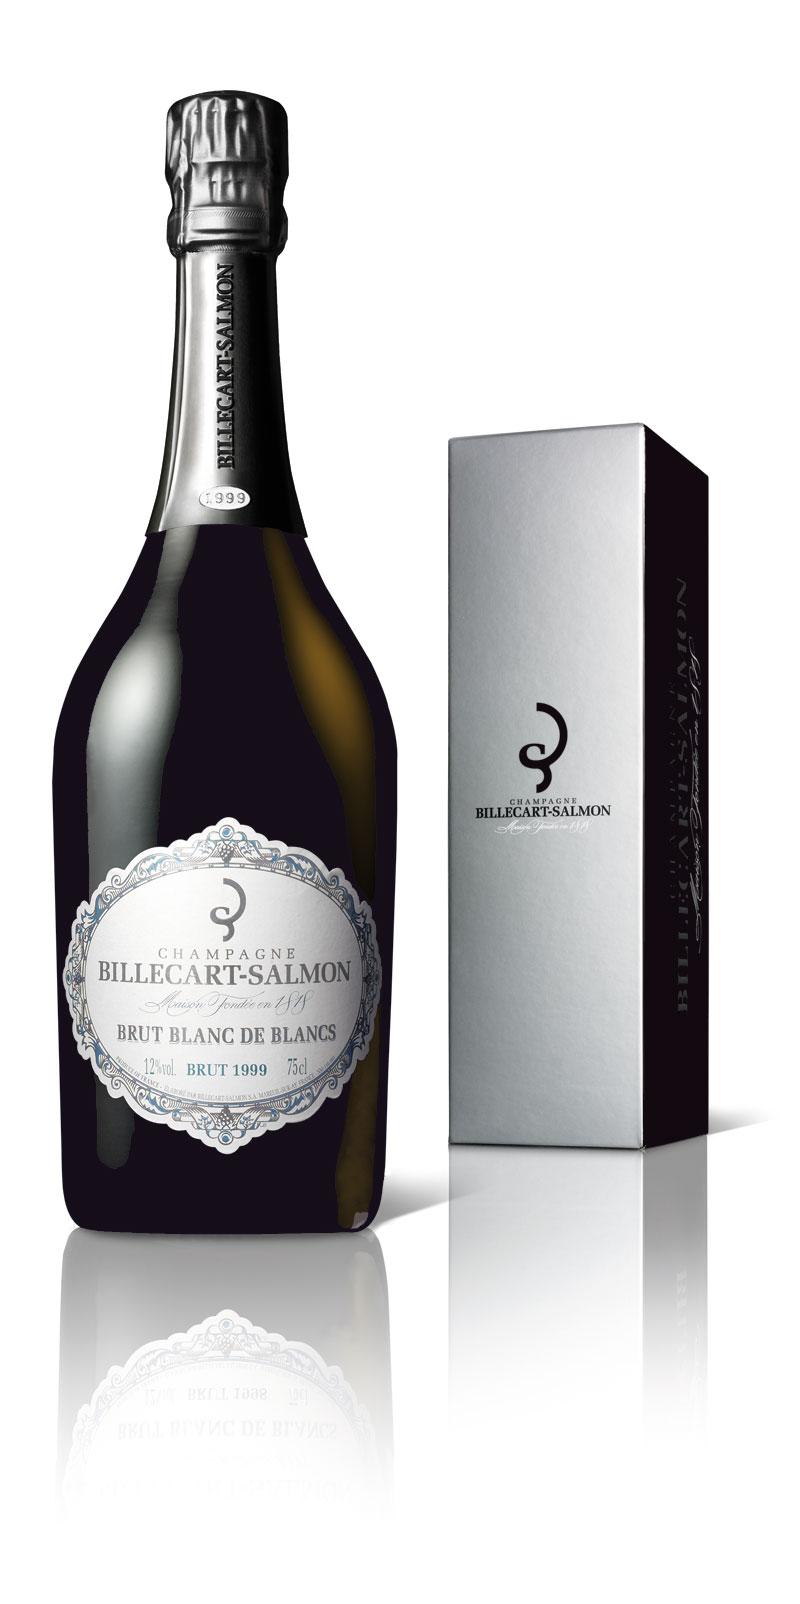 styles of champagne champagne guru. Black Bedroom Furniture Sets. Home Design Ideas